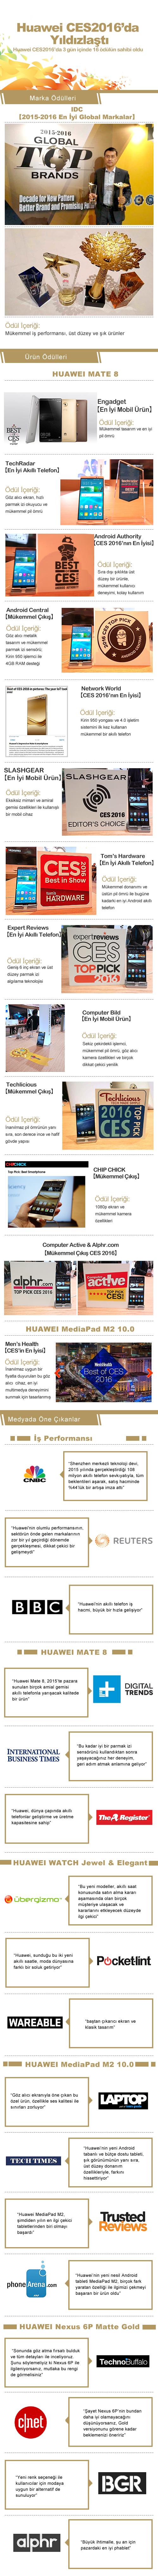 Huawei_CES_ödül